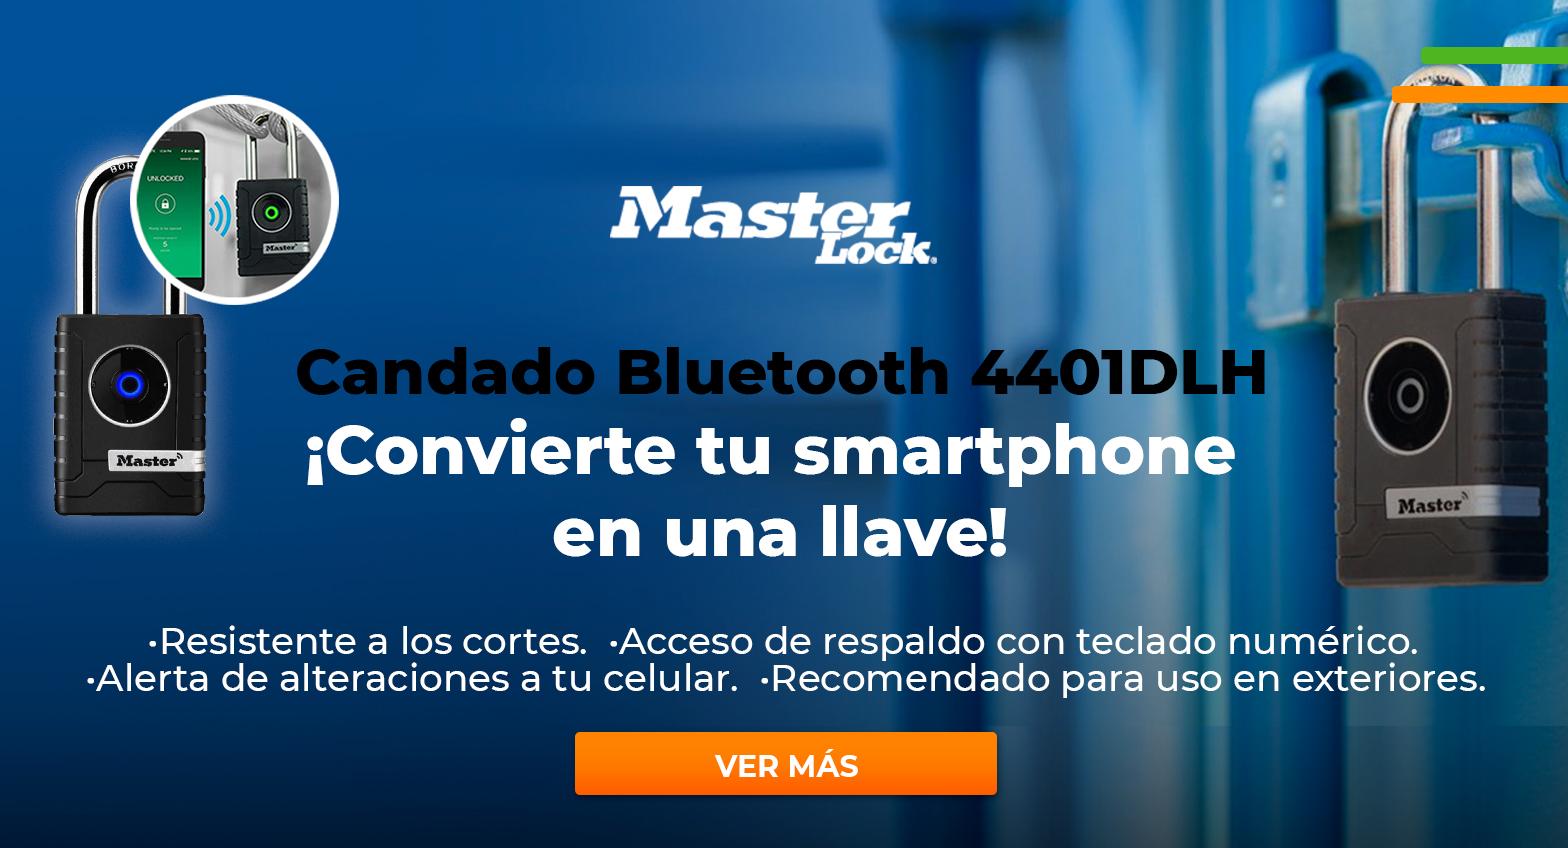 Candado Bluetooth Masterlock